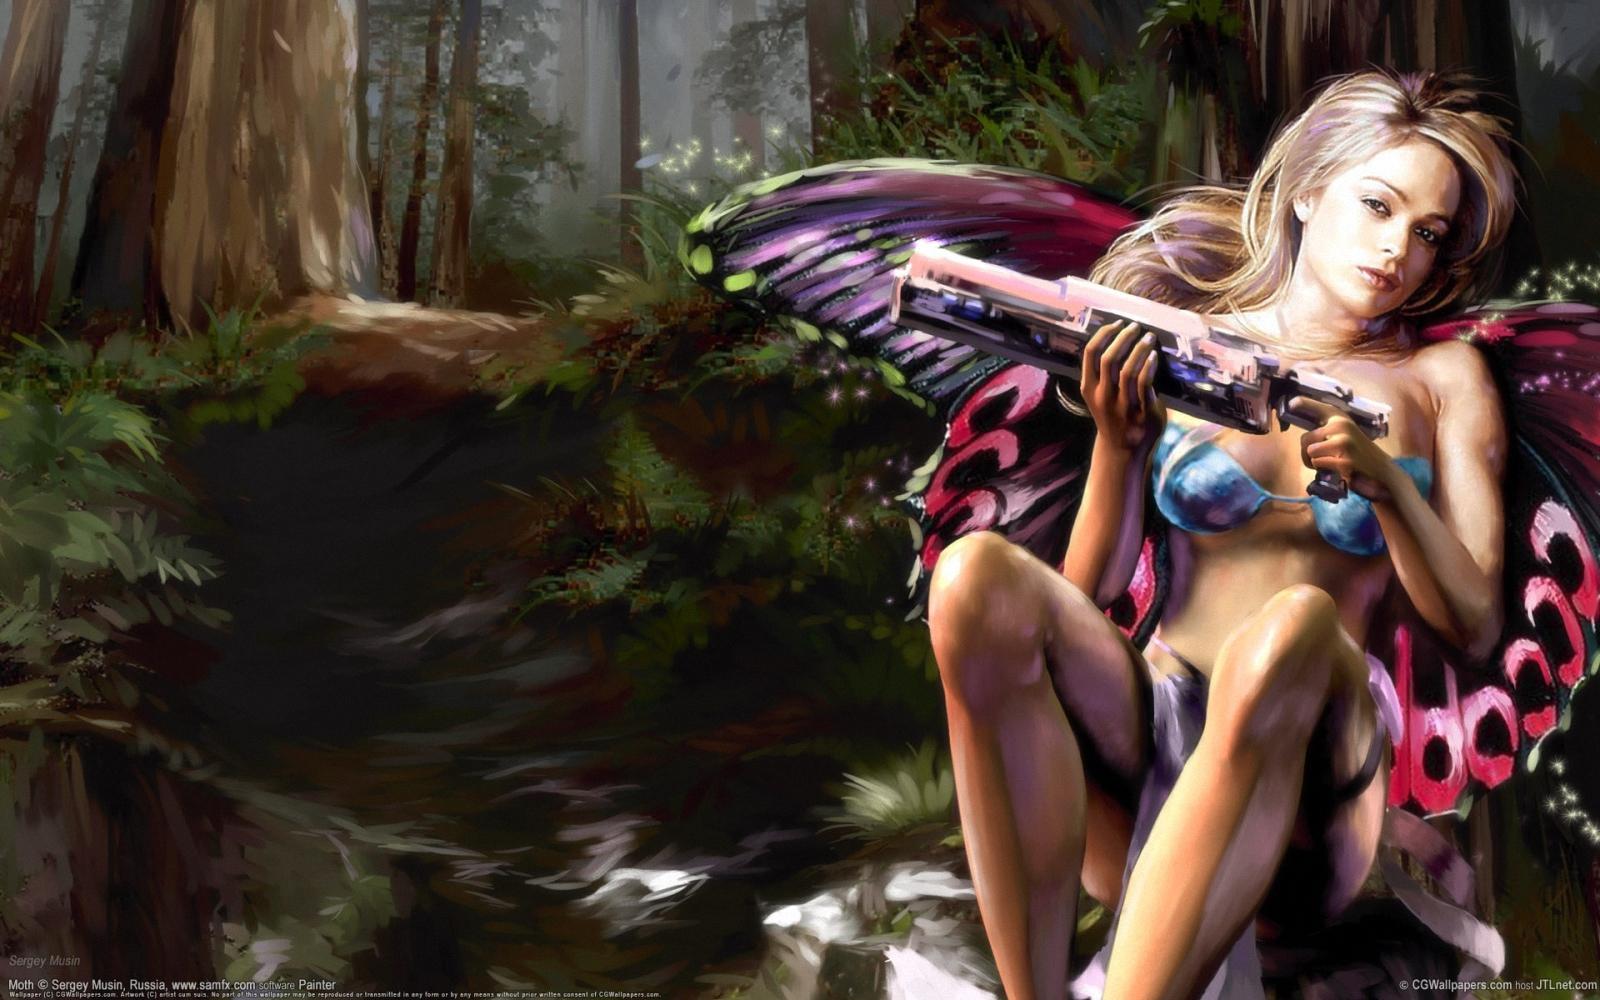 Pron fantasy net hentia images